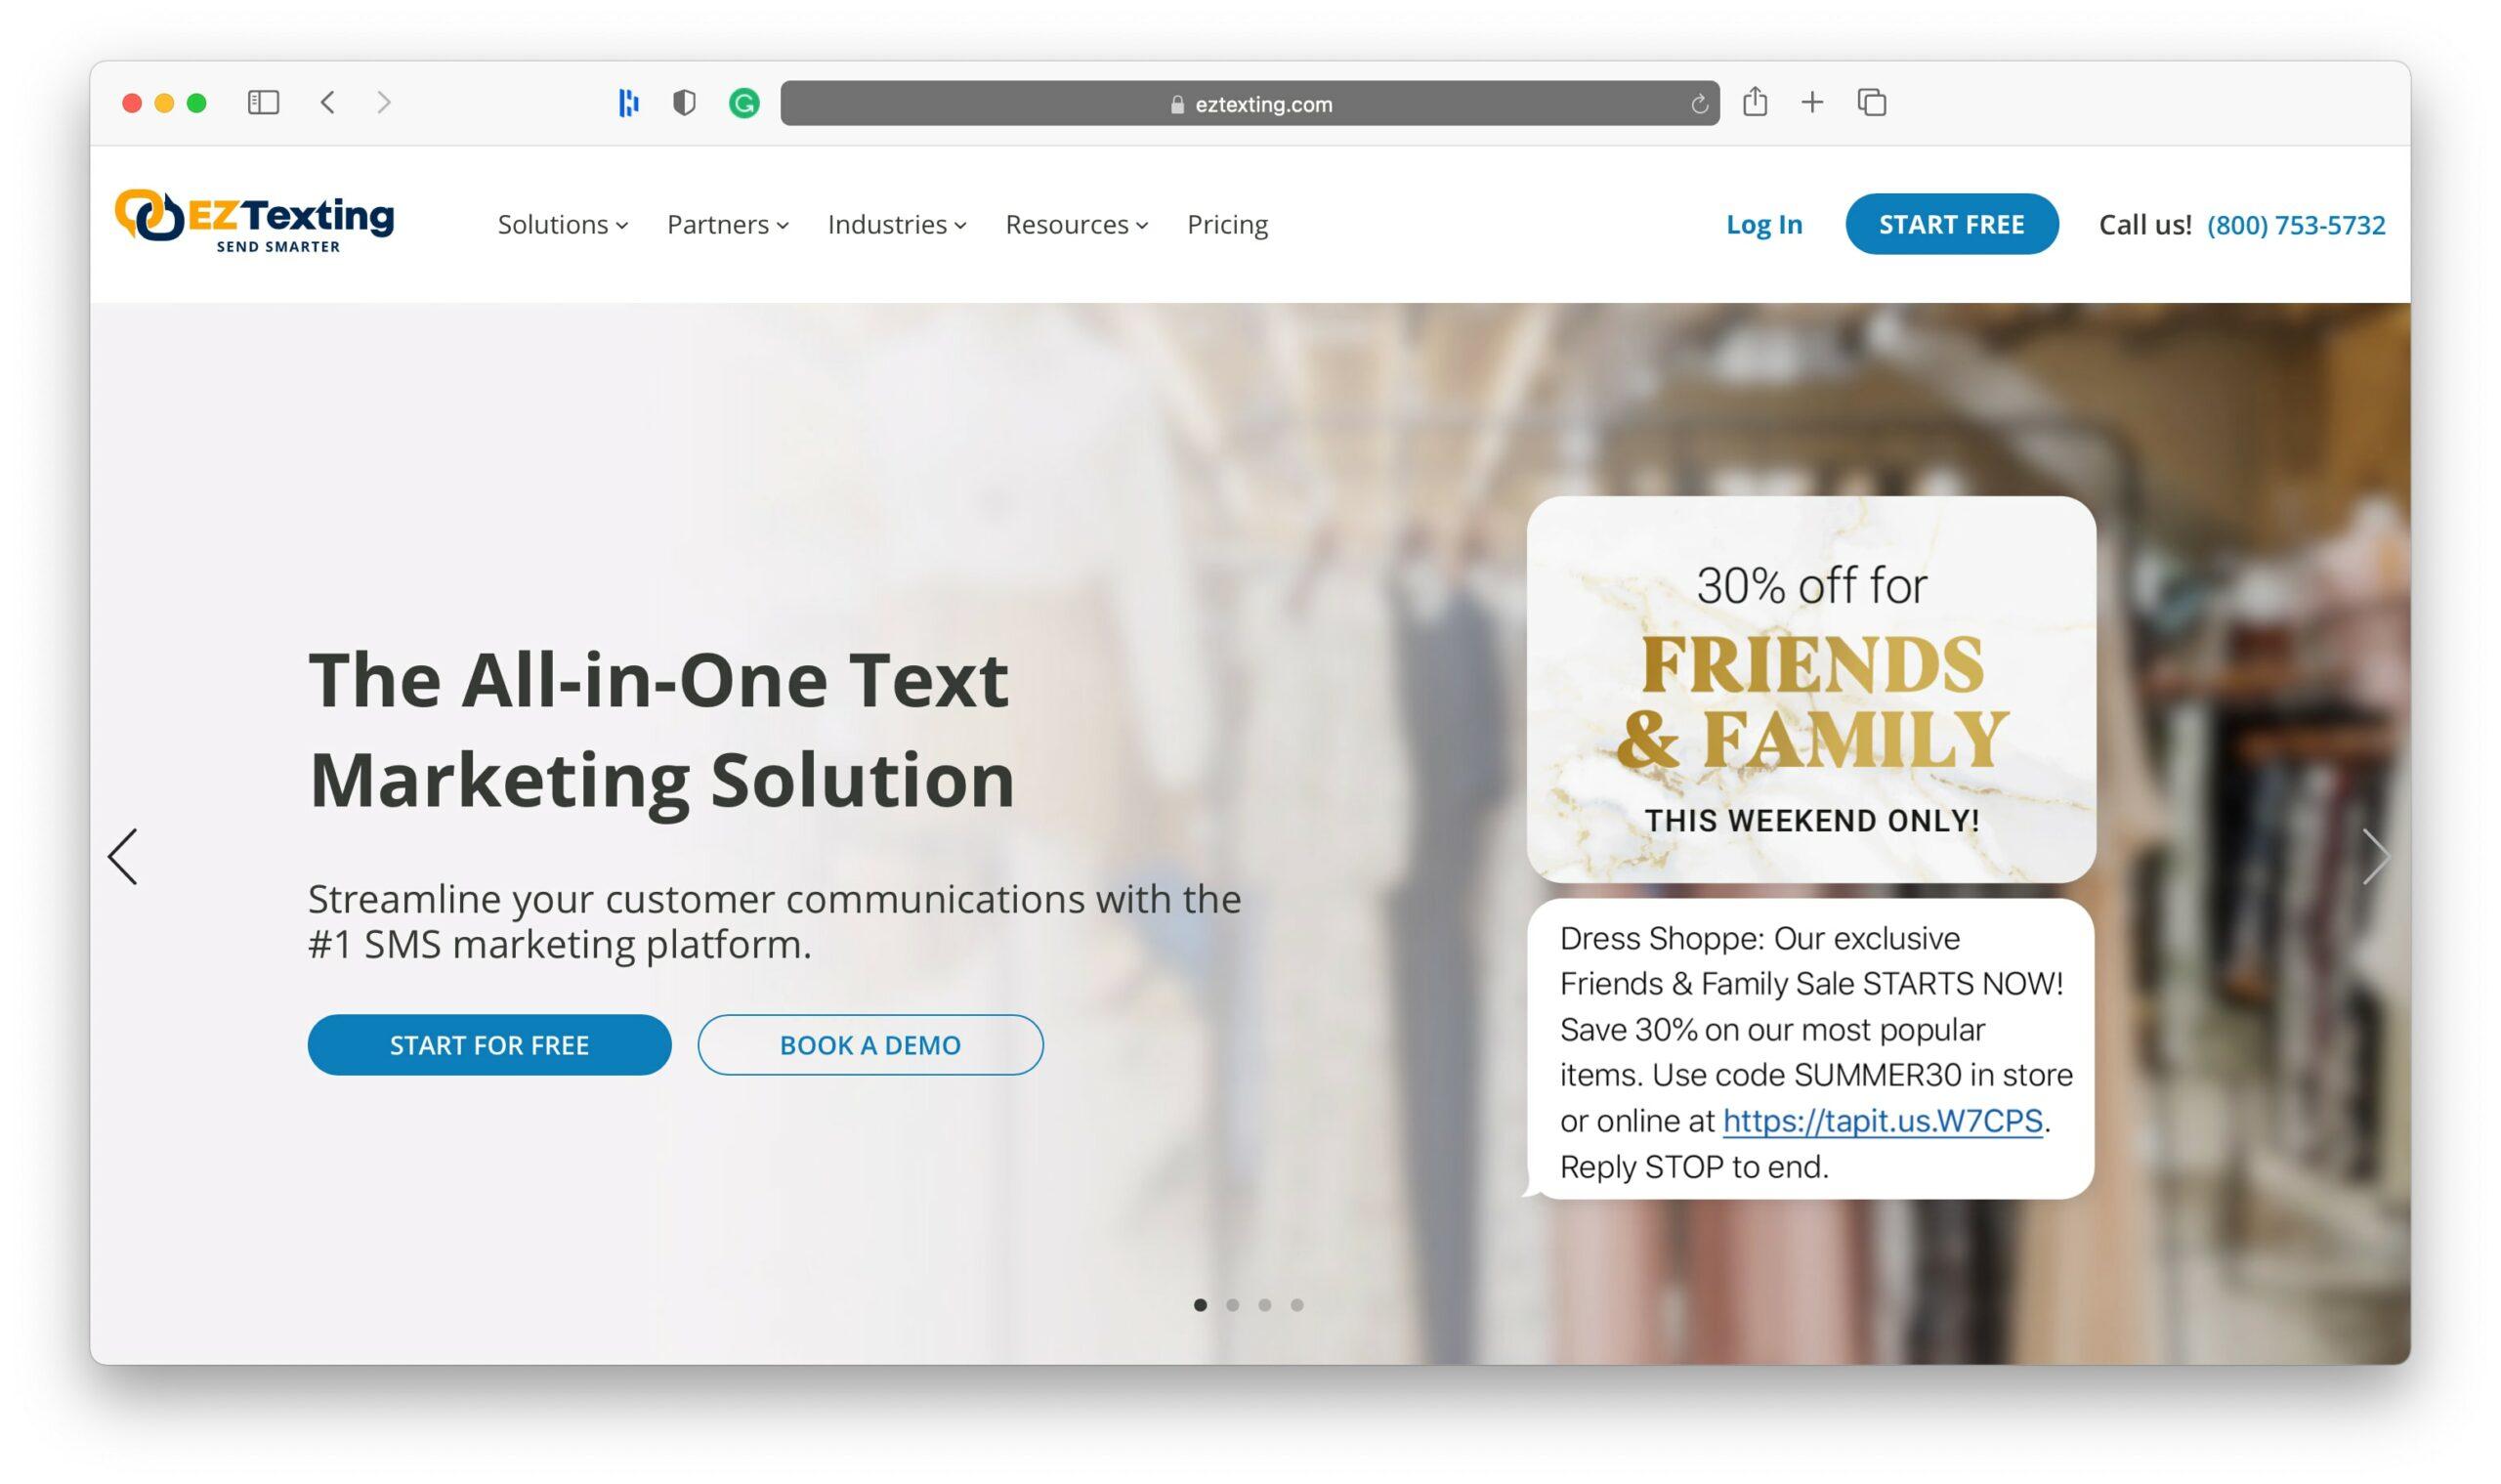 EZ Texting SMS Marketing Tools